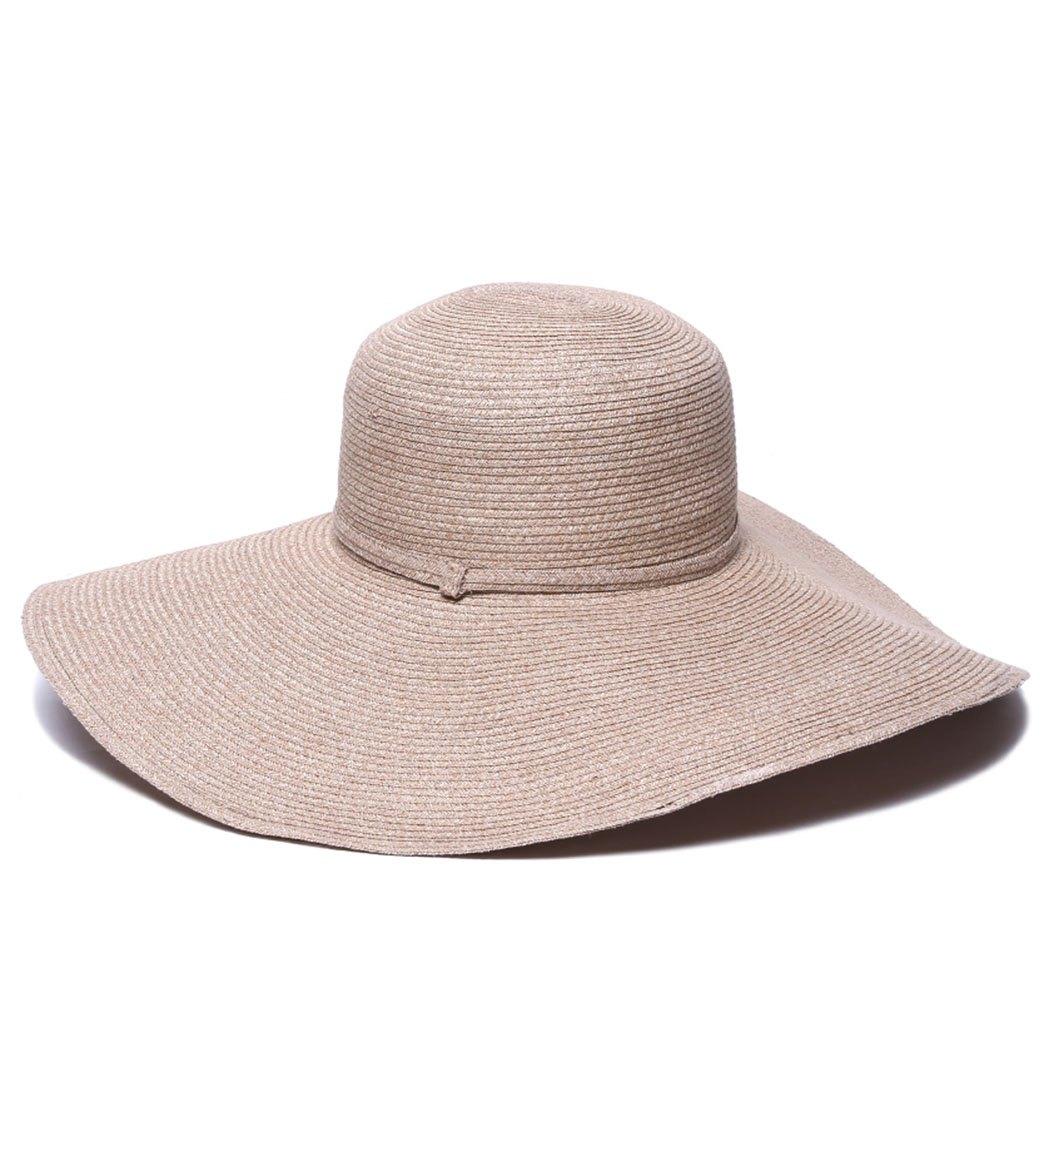 18708eb7 Physician Endorsed Sophia Sun Hat at SwimOutlet.com